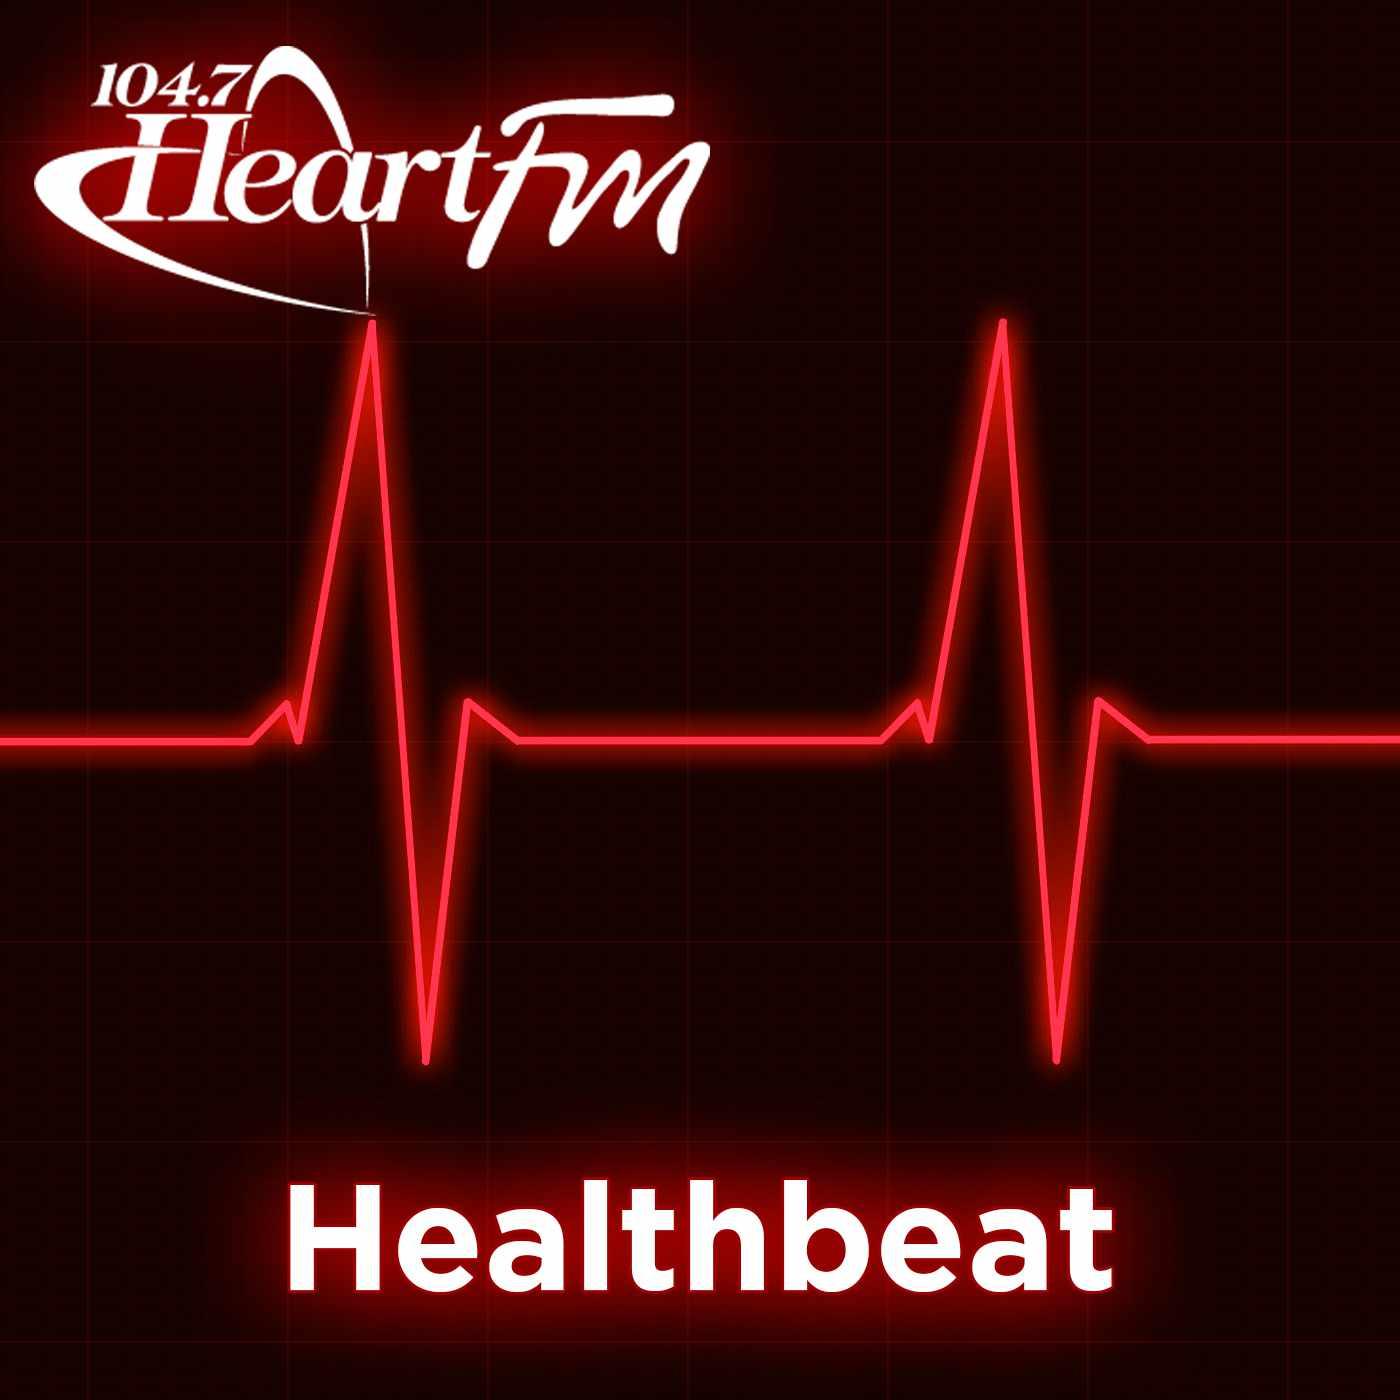 Heart FM Healthbeat